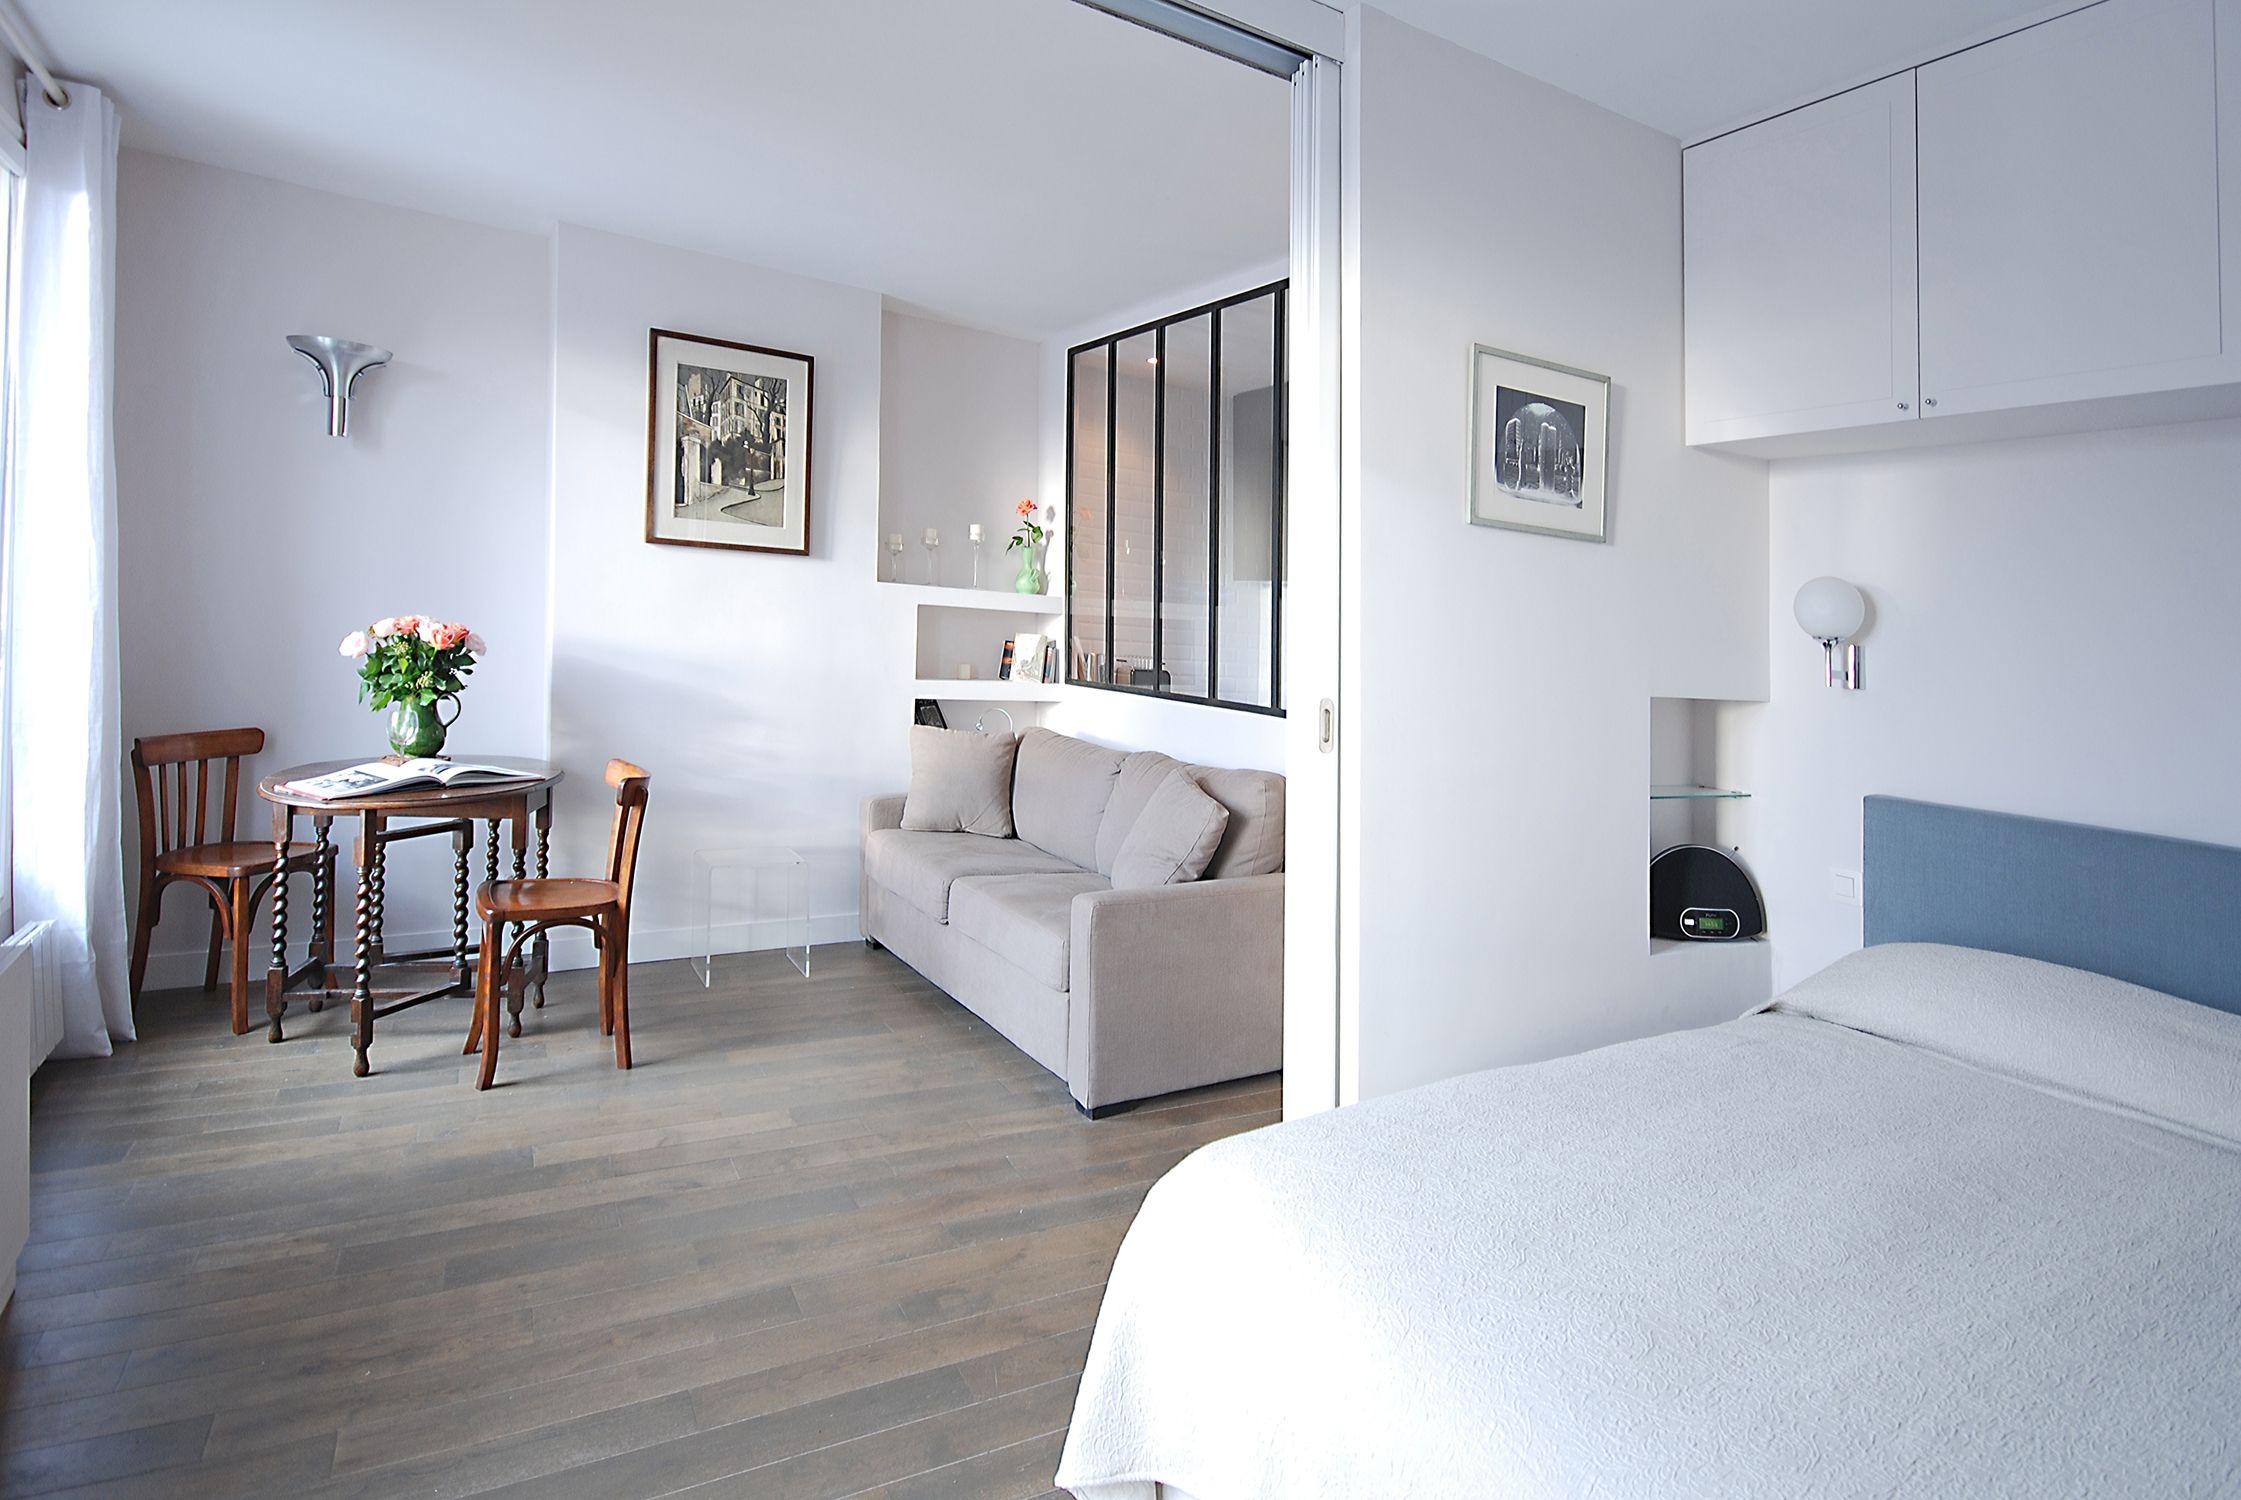 Renovated studio in paris with sliding doors to separate - Architecte interieur paris petite surface ...